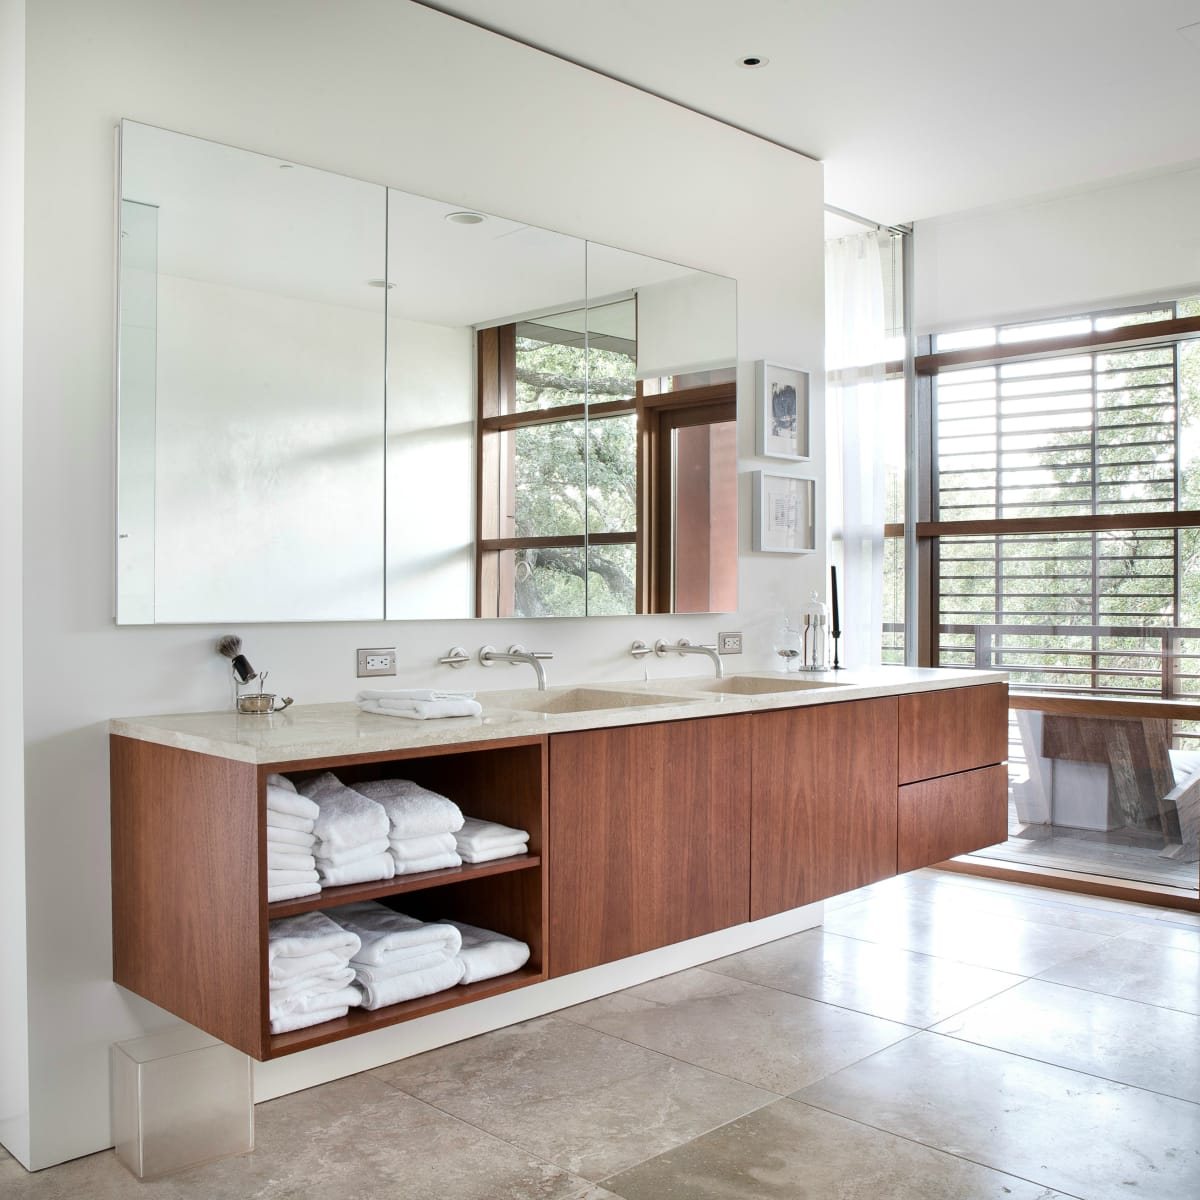 Austin home Floating Box House 900 Live Oak Circle West Lake Hills 78746 April 2016 master bathroom